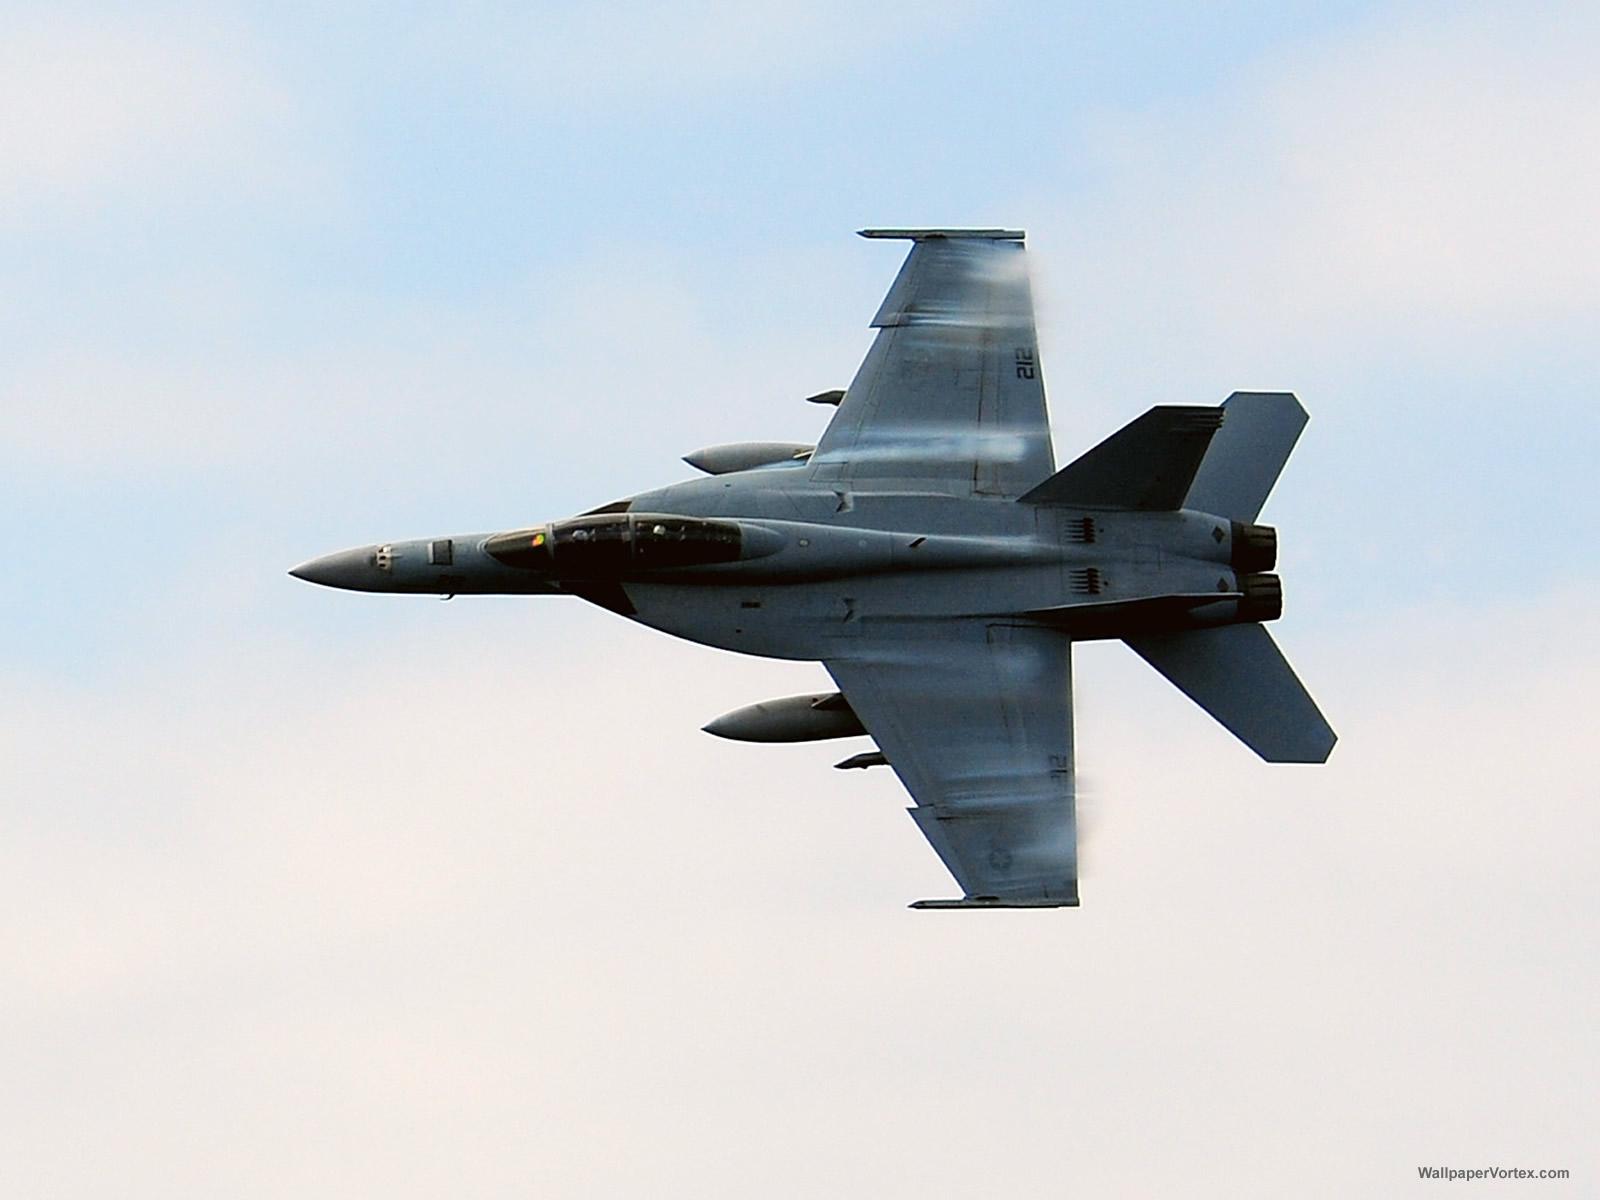 http://1.bp.blogspot.com/-xl4dnfjUZQg/Tmb5P21B5AI/AAAAAAAABUw/sBMelFMGKm4/s1600/3039-military_f_a_18f_super_hornet_wallpaper.jpg